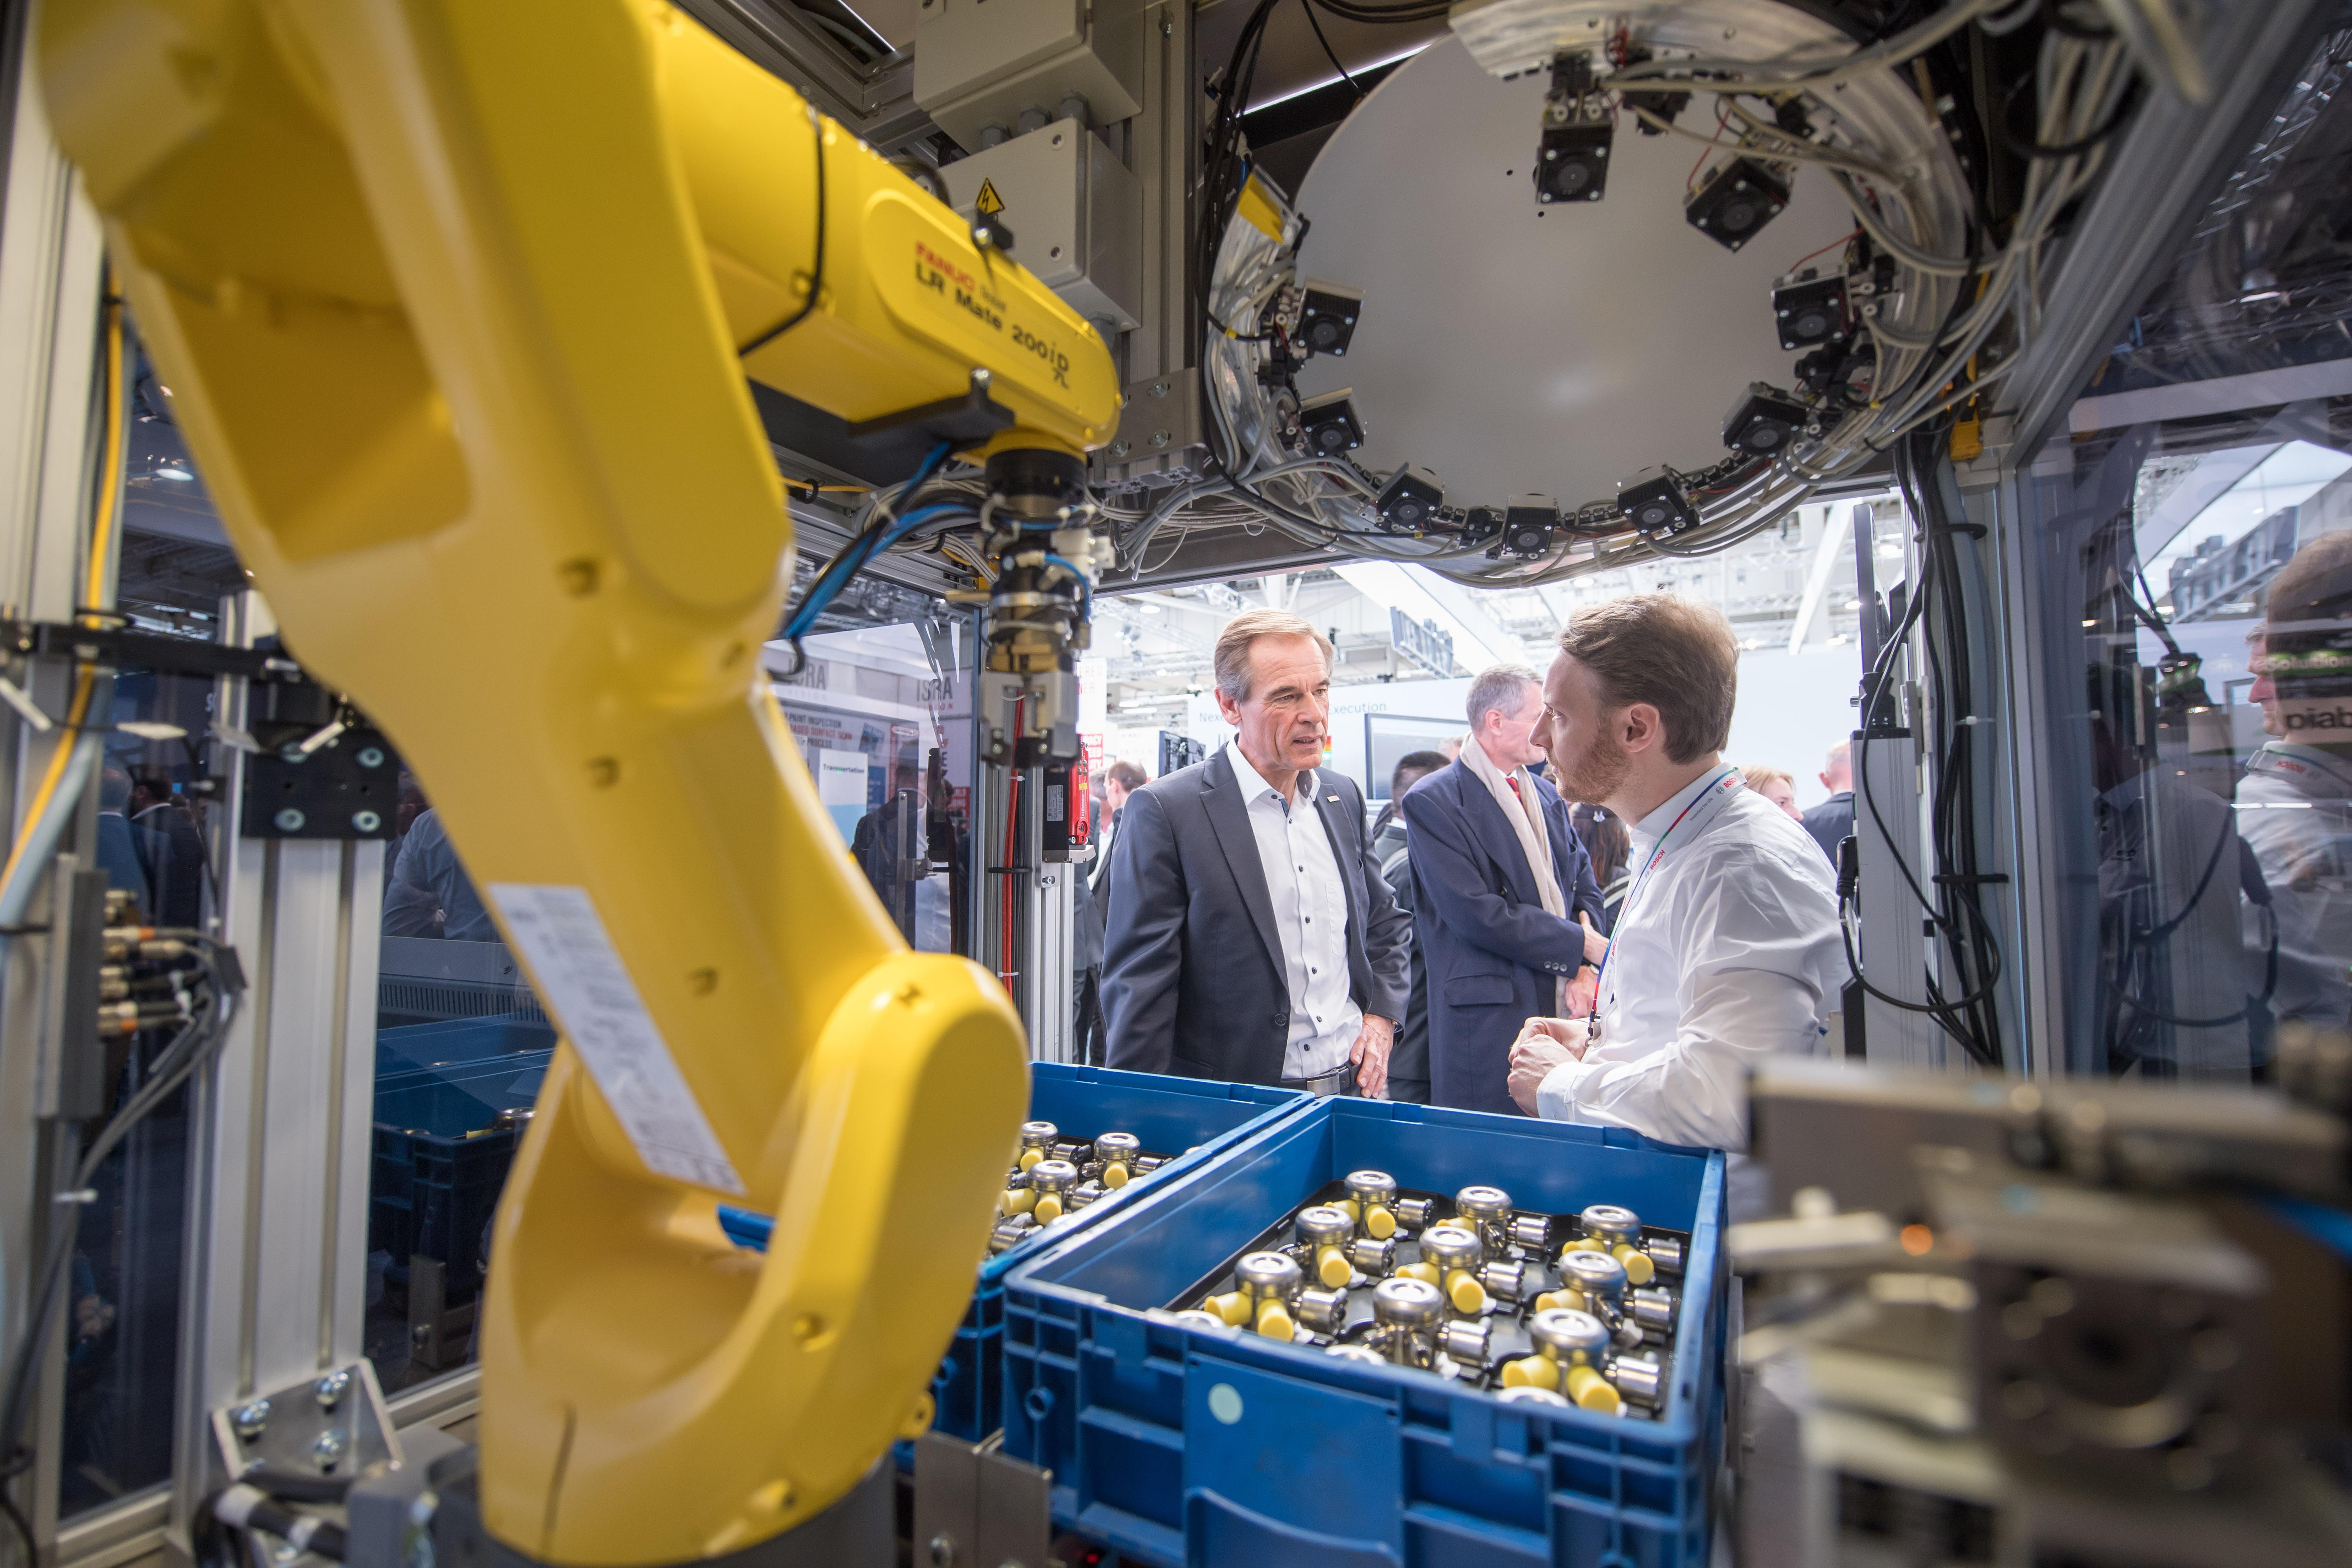 Na veľtrhu Hannover Messe 2019 prezentuje Bosch svoj vlastný výskumný projekt: Optická detekcia chýb založená na AI